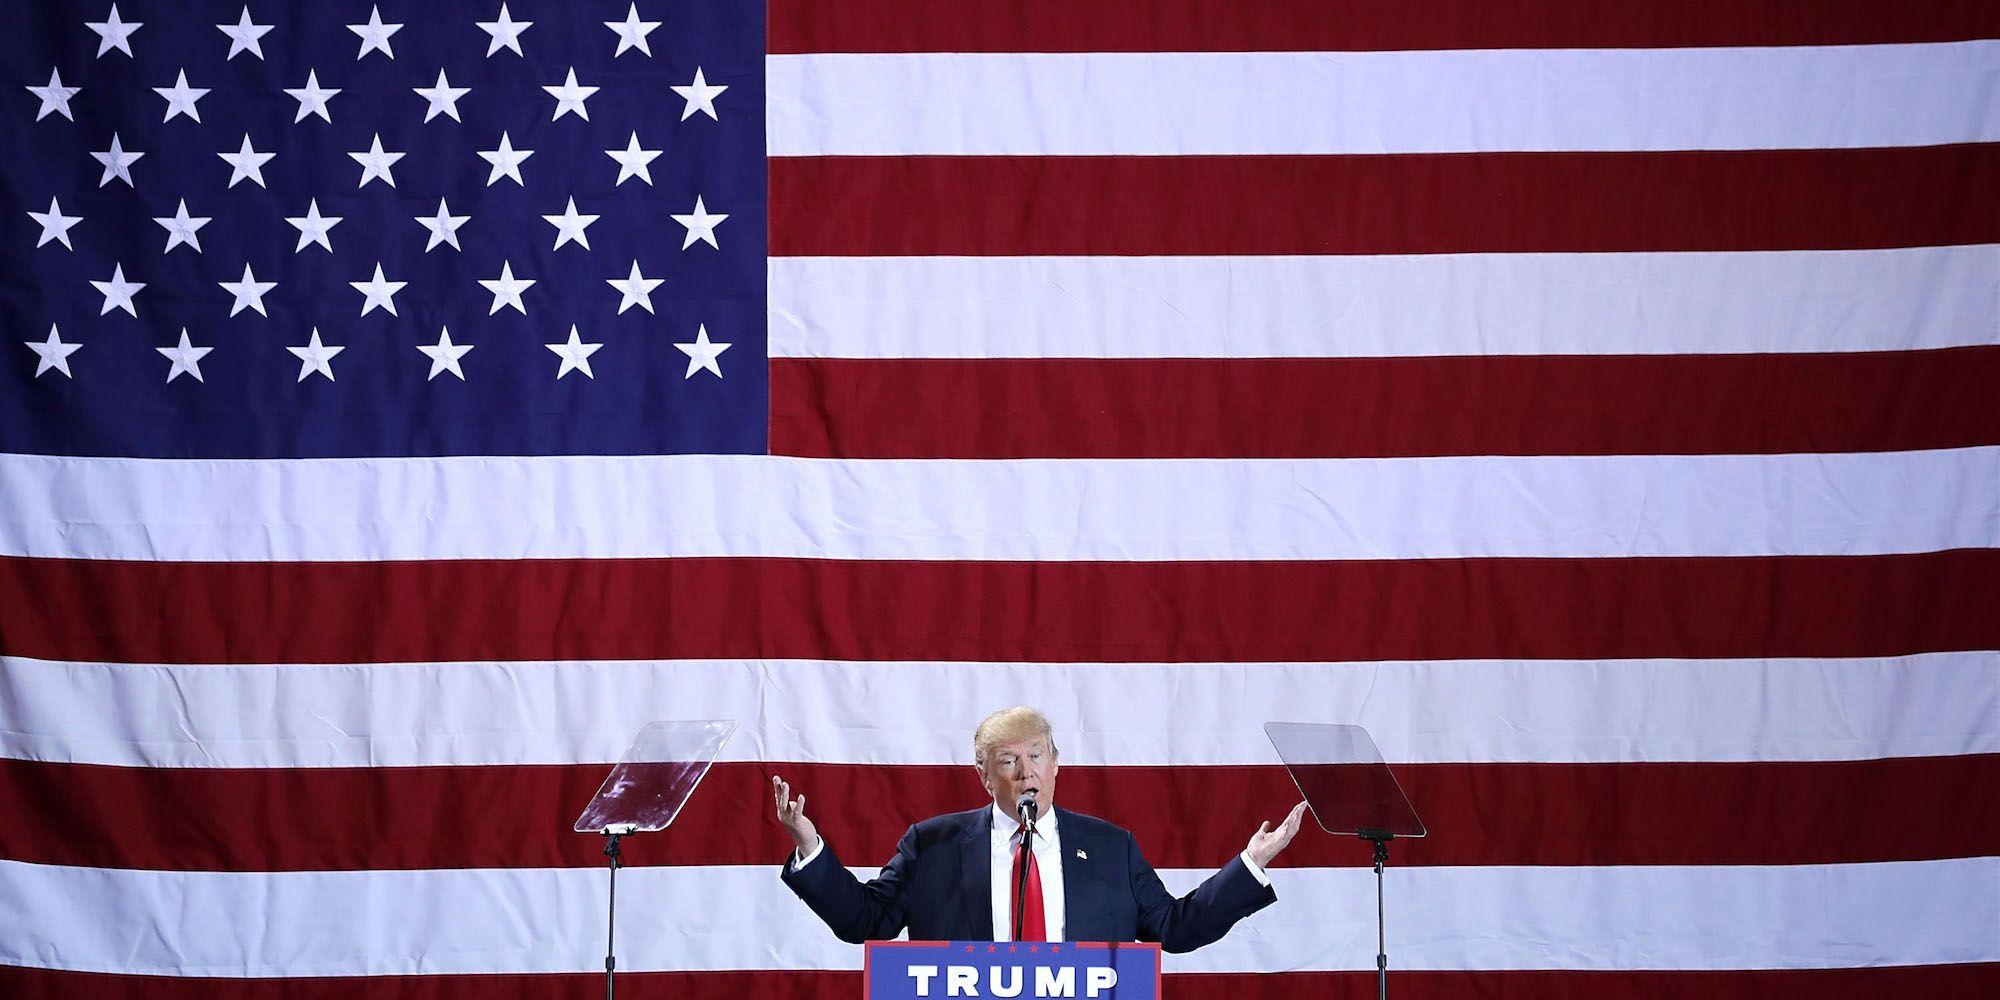 GOP Presidential Nominee Donald Trump Campaigns In Michigan